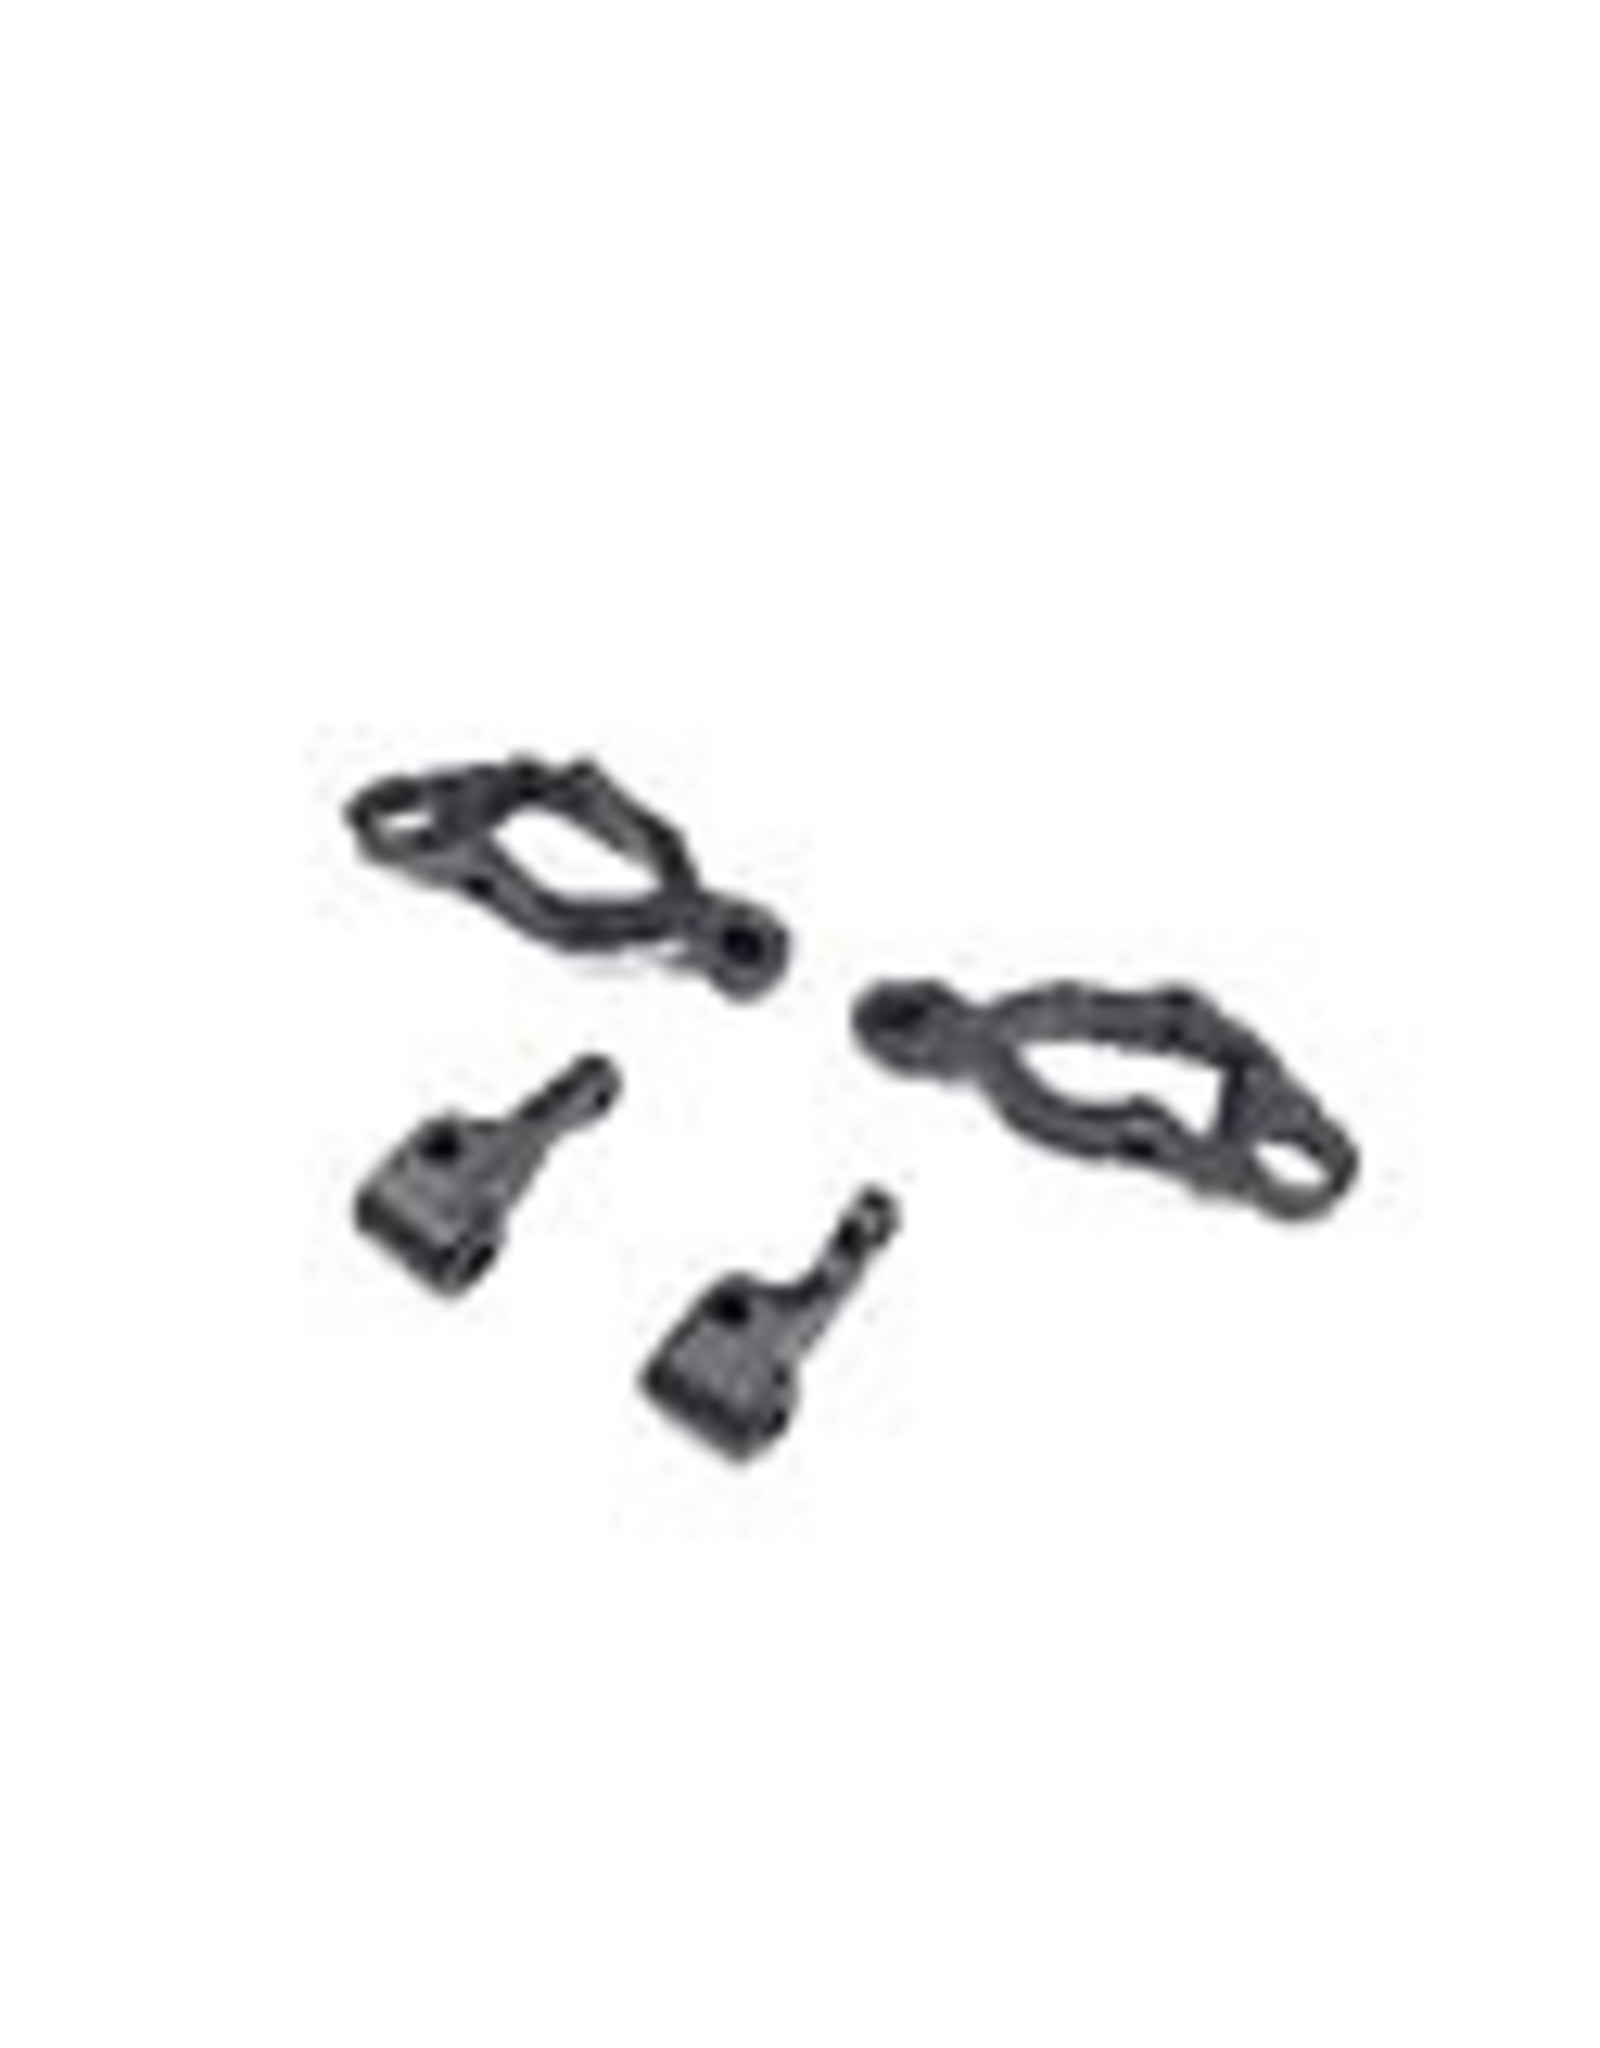 GL Racing GLR Upper Arms, Steering knuckles (GLR-S002)